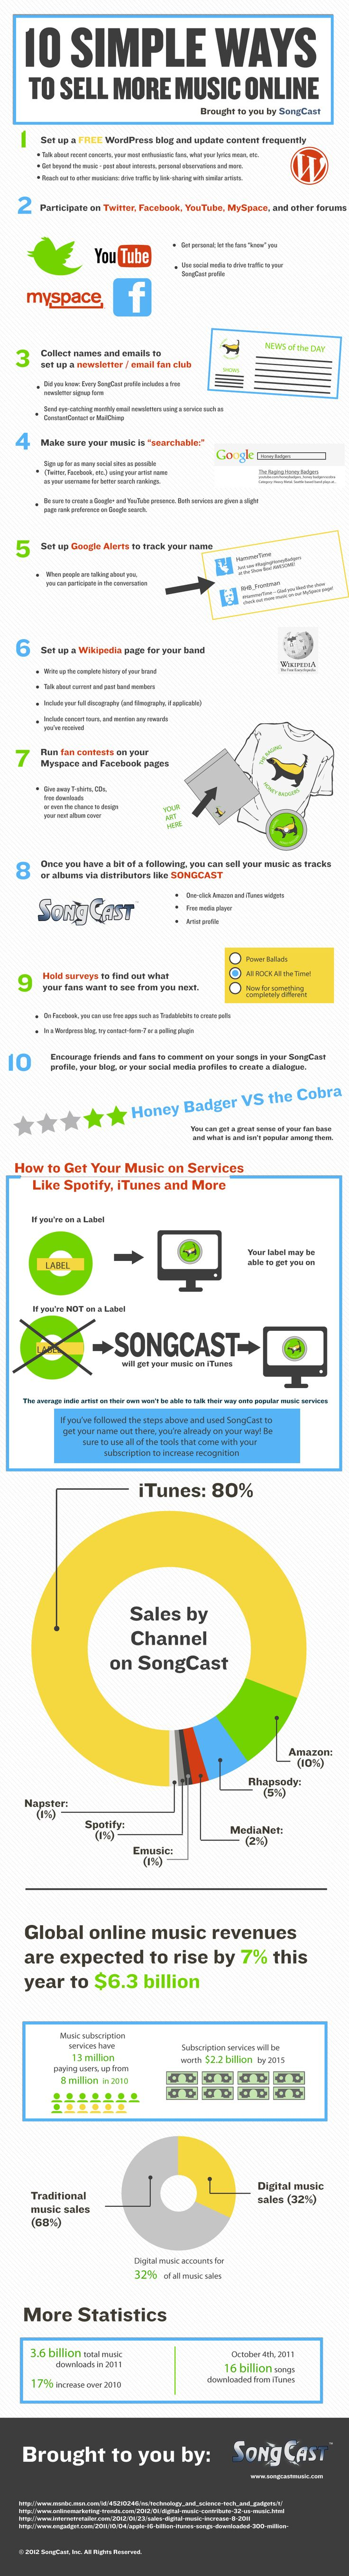 10 formas de comprar #musica online // sell music online